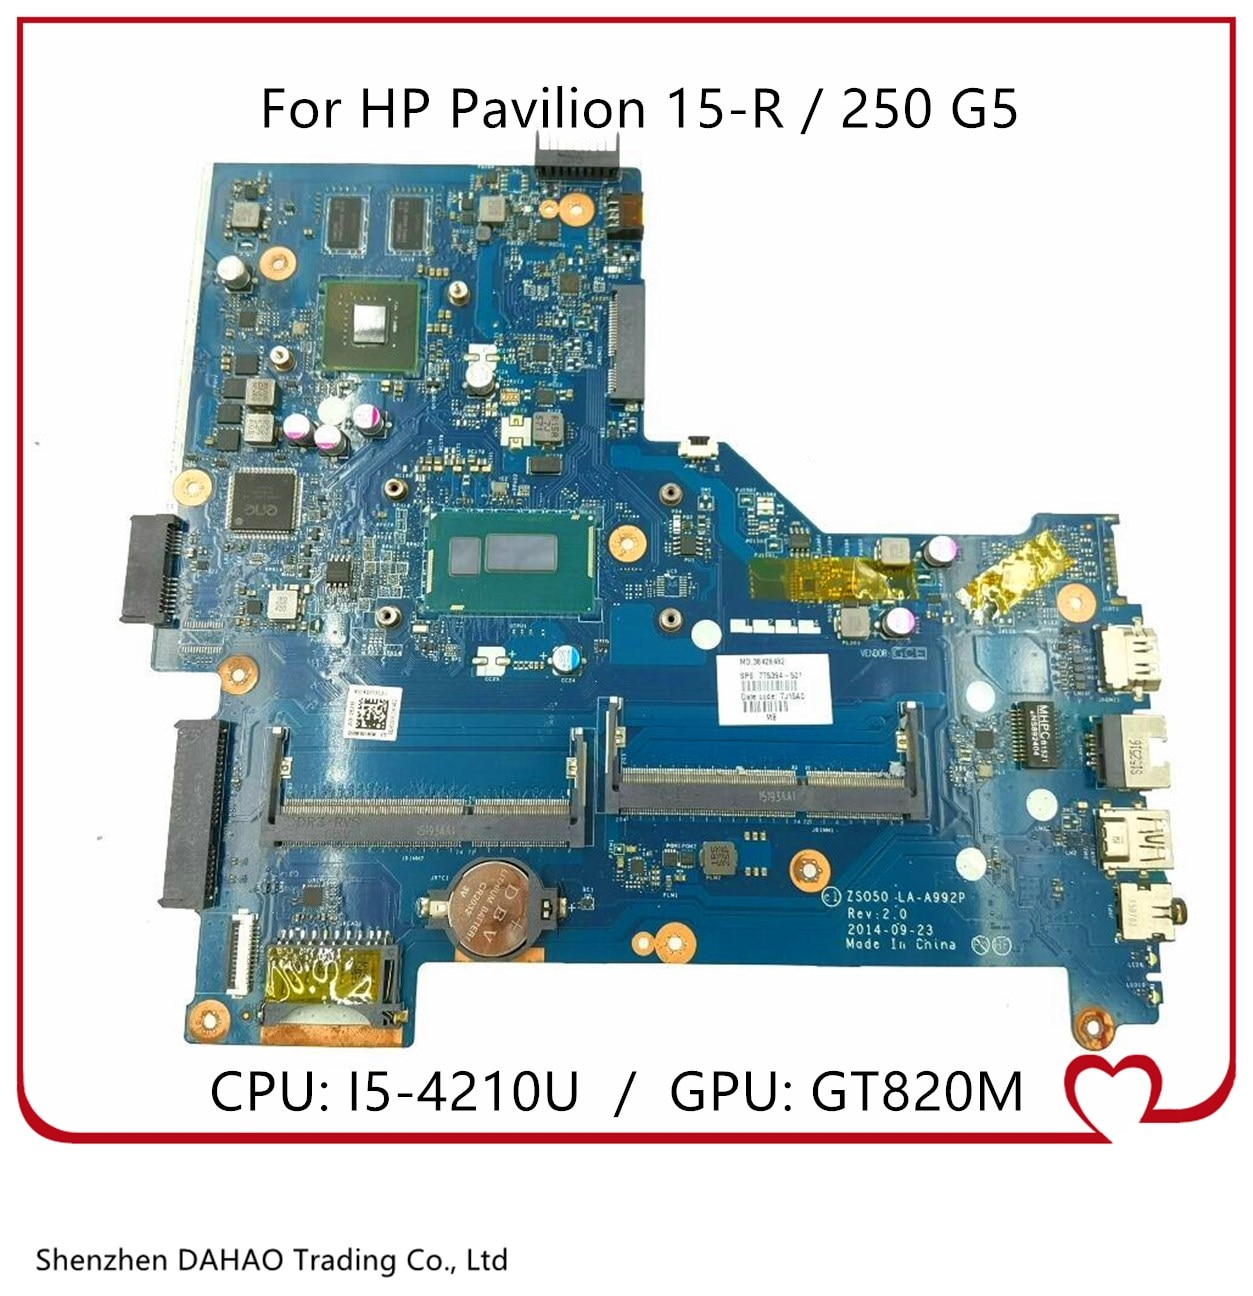 ZSO50 LA-A992P MB ل HP 250 G3 15-R اللوحة المحمول مع i5-4210U CPU GT820M GPU 760970-501 760970-001 760970-601 100% العمل